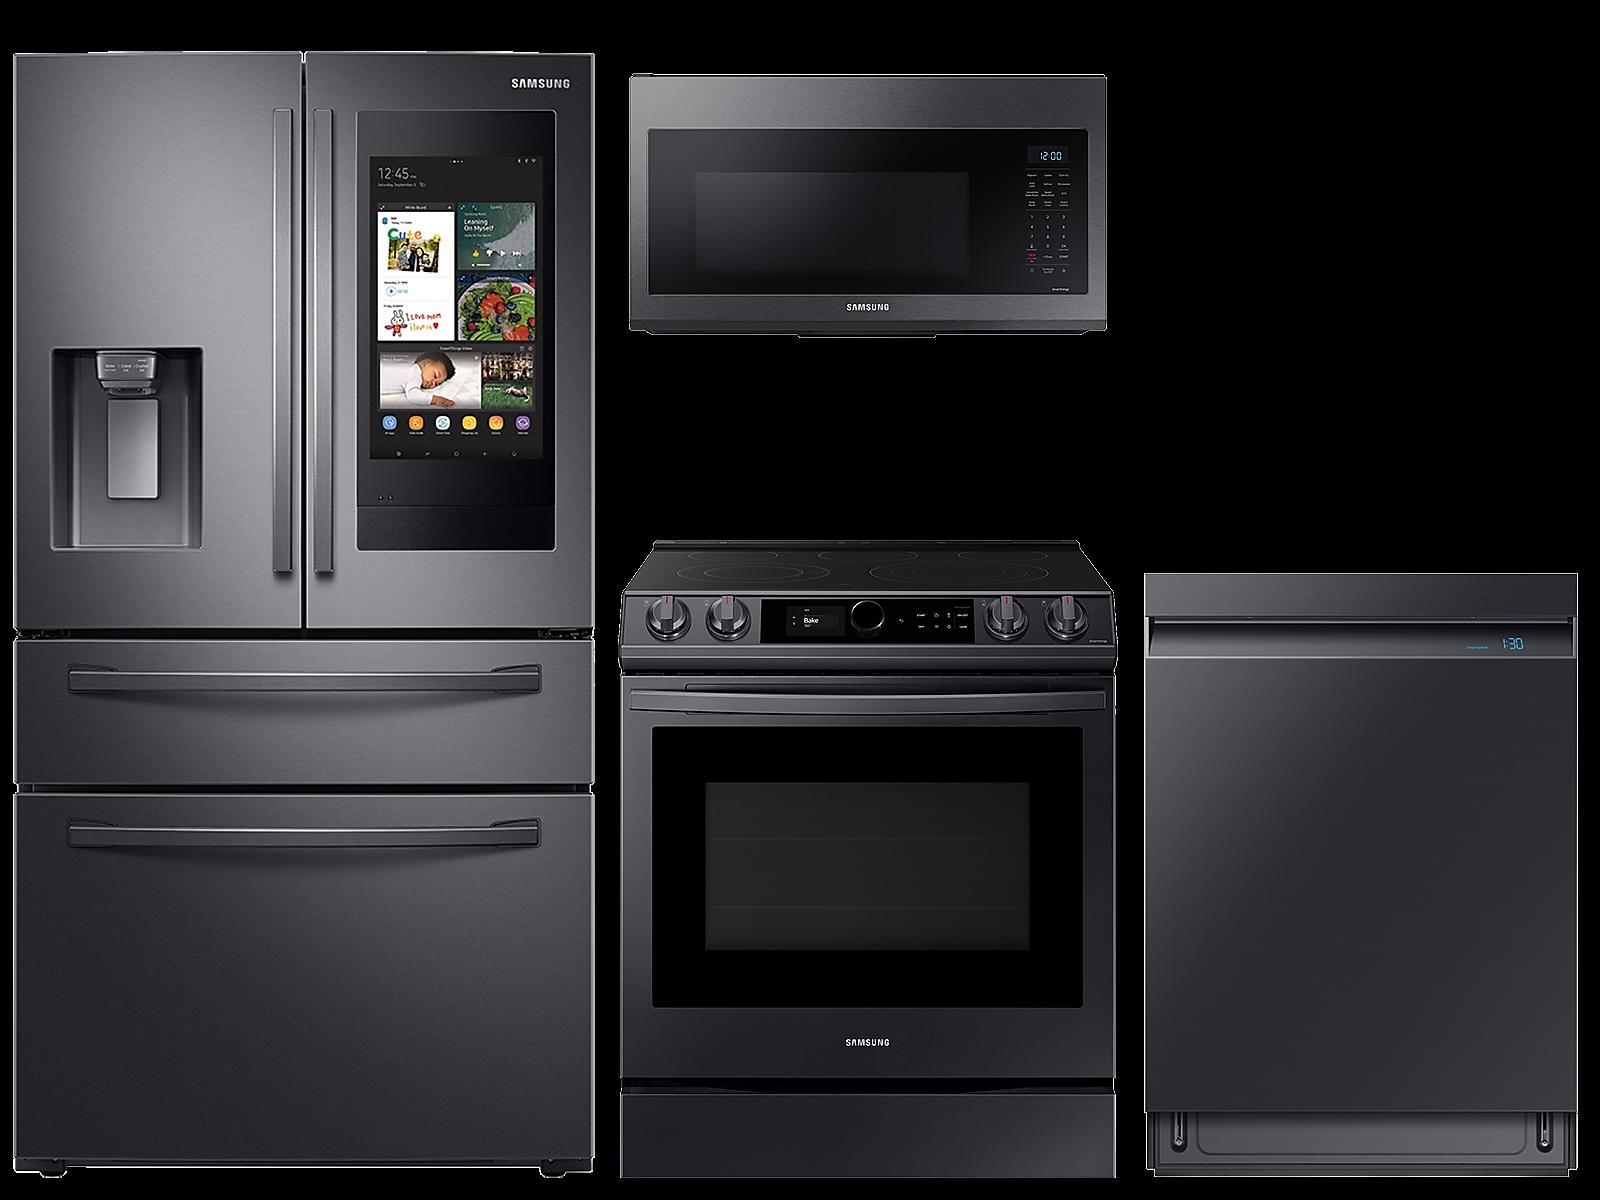 Samsung coupon: Samsung 28 cu. ft. Family HubTM 4-door refrigerator, 6.3 cu. ft. electic range, microwave and Smart Linear dishwasher package(BNDL-1613151704265)